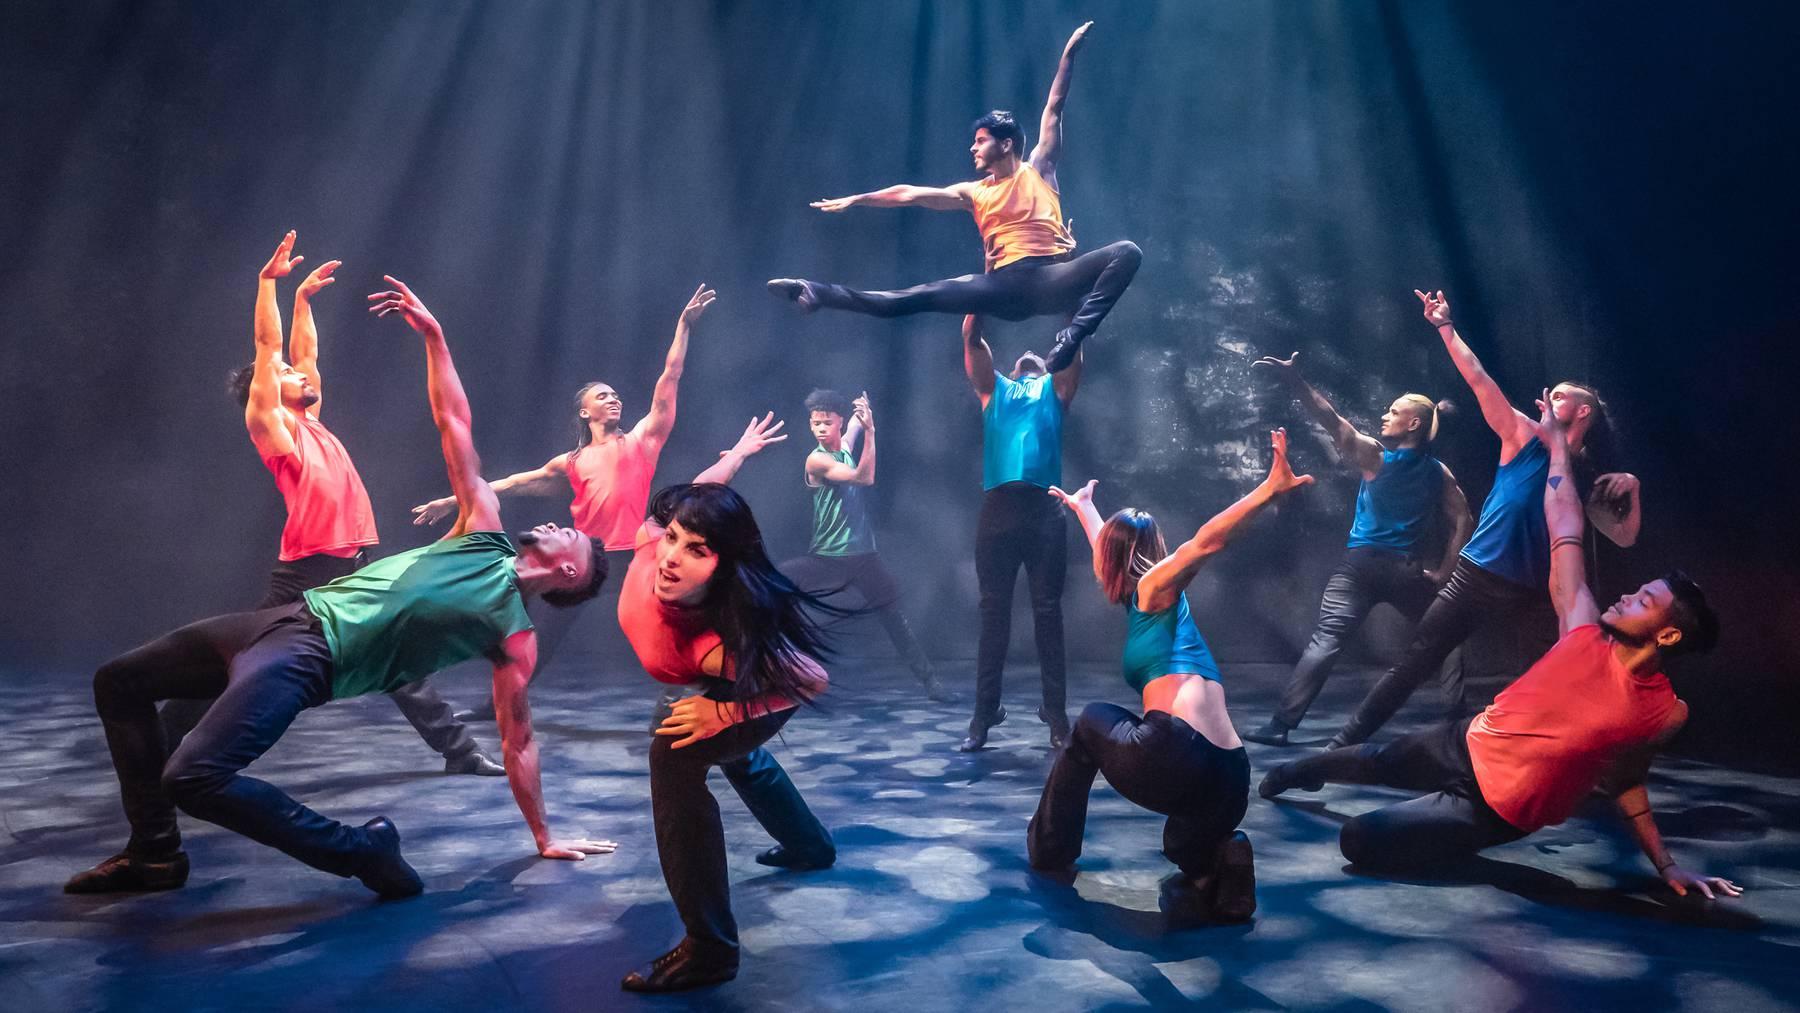 ballet-revolucion-foto-08-credit-johan-persson